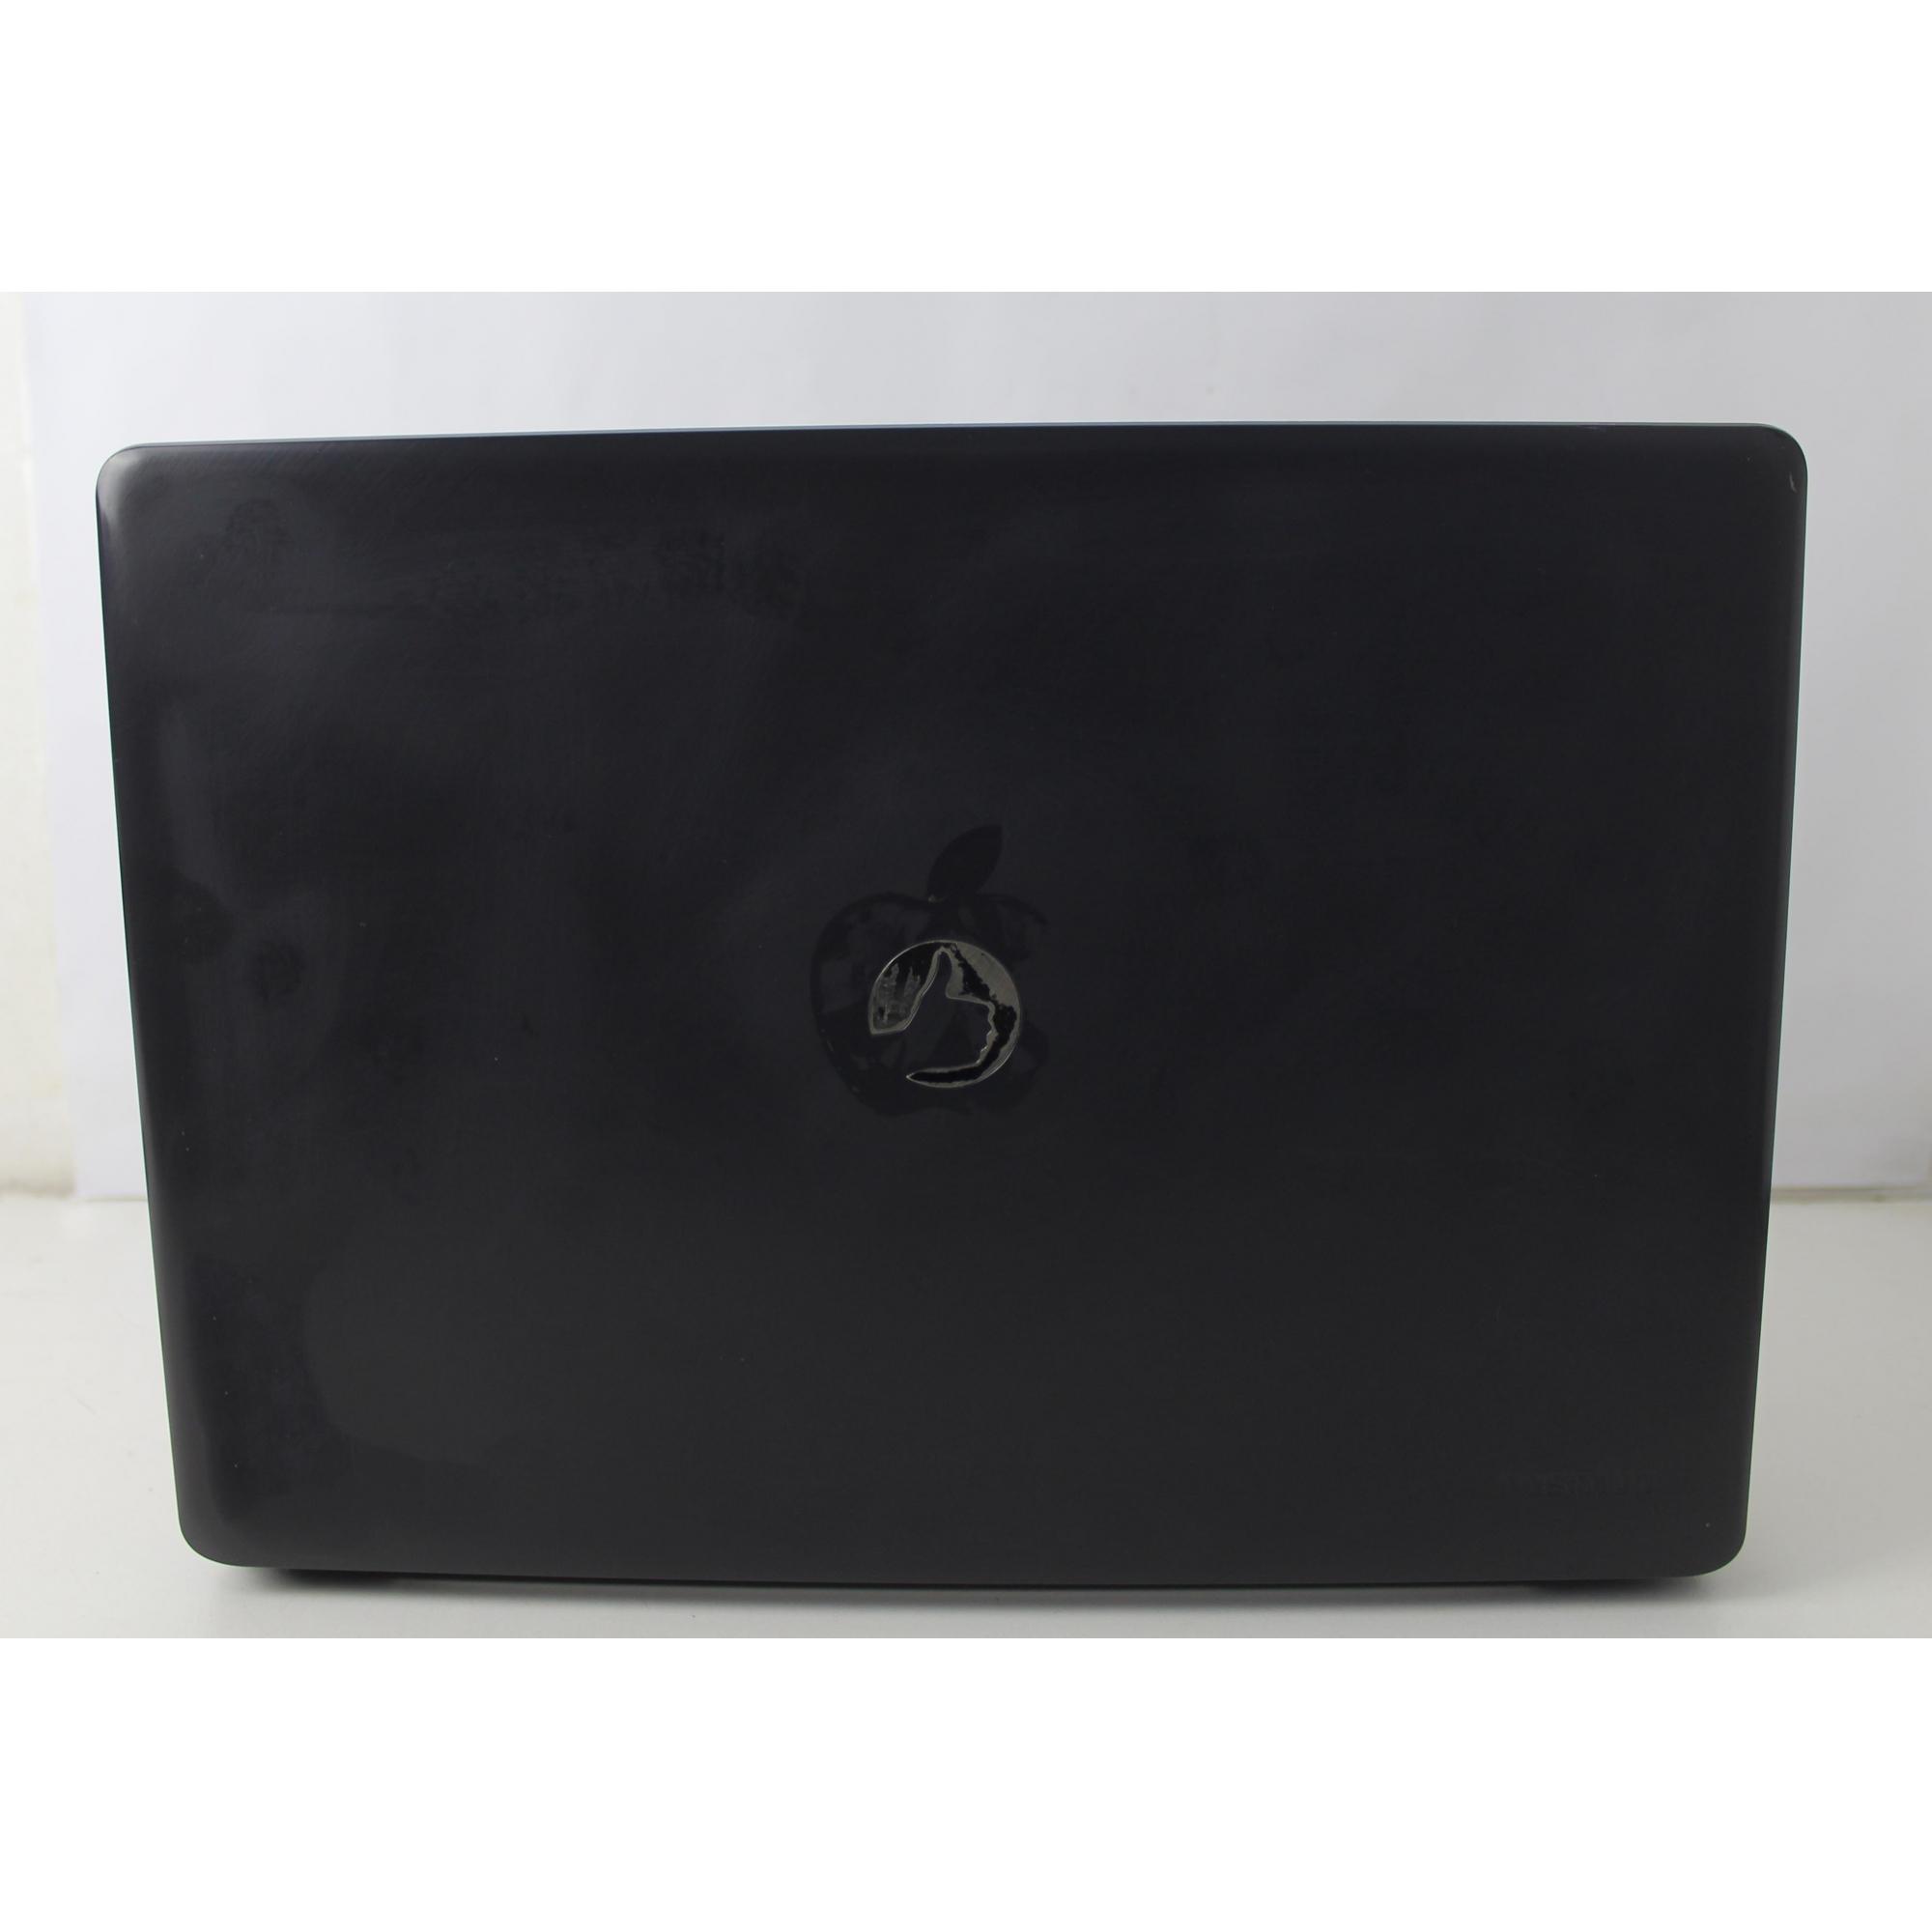 NOTEBOOK POSITIVO STILO XC3620 14'' DUAL CORE 4GB HD-500GB